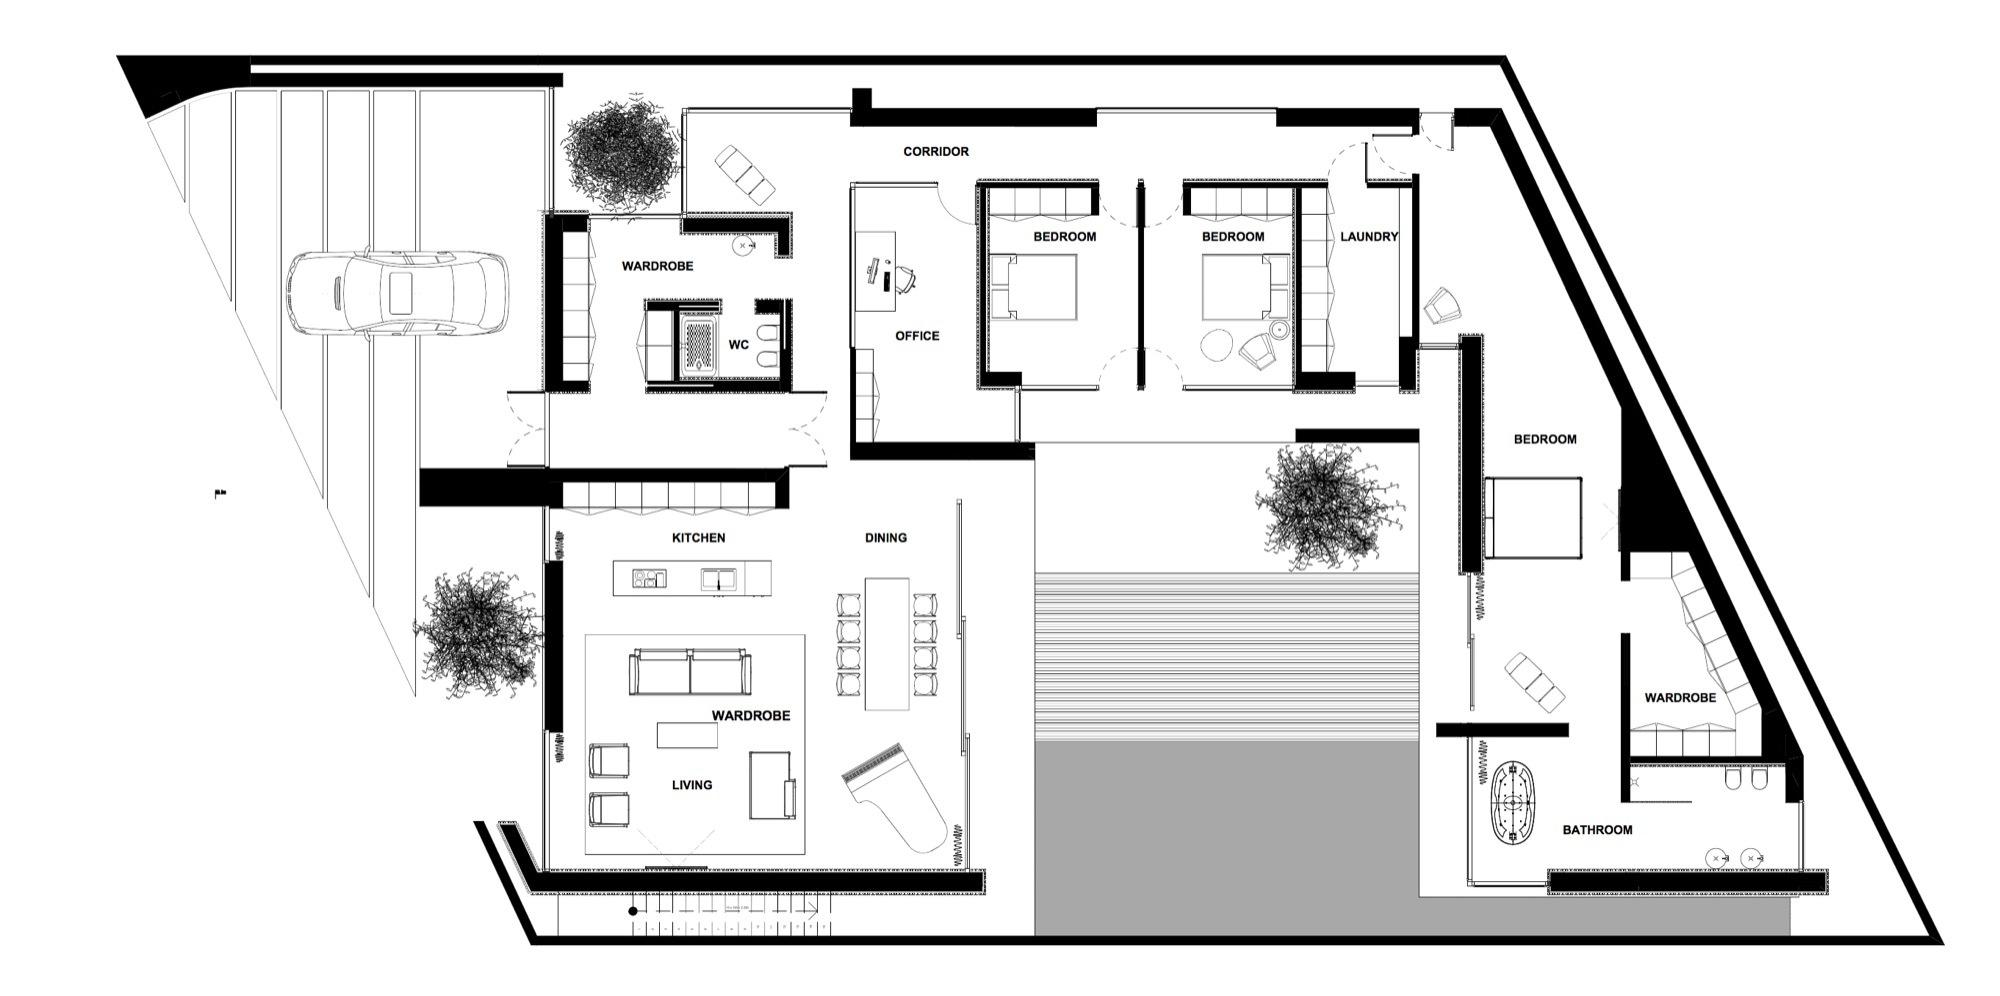 Galeria de casa piano line architects 50 for House plans under 200 000